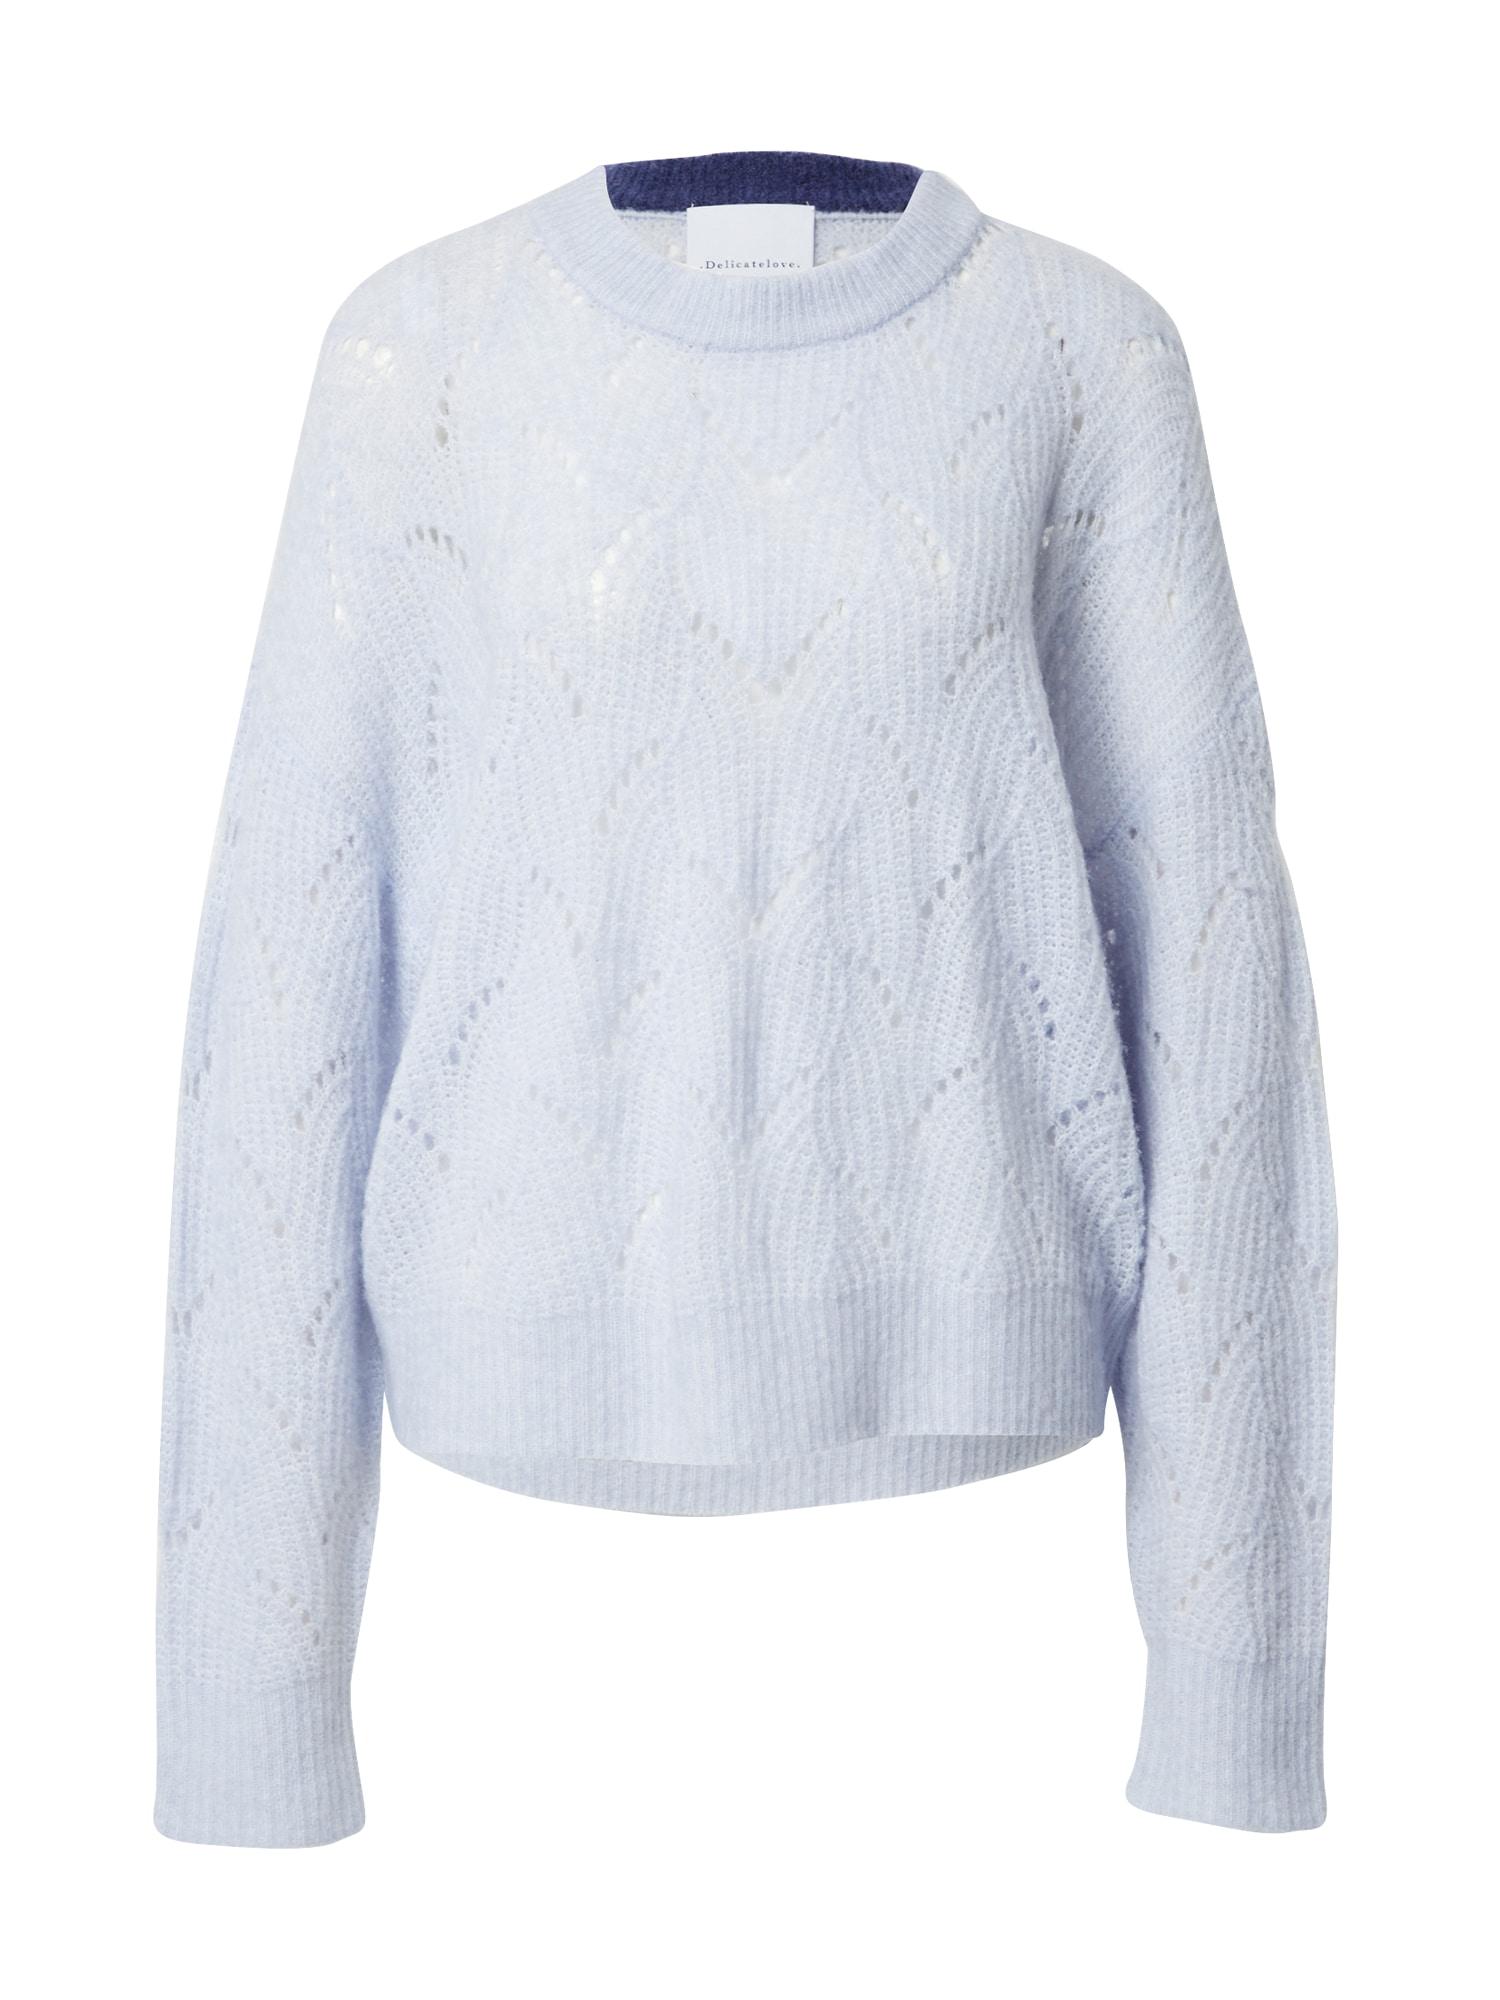 DELICATELOVE Megztinis